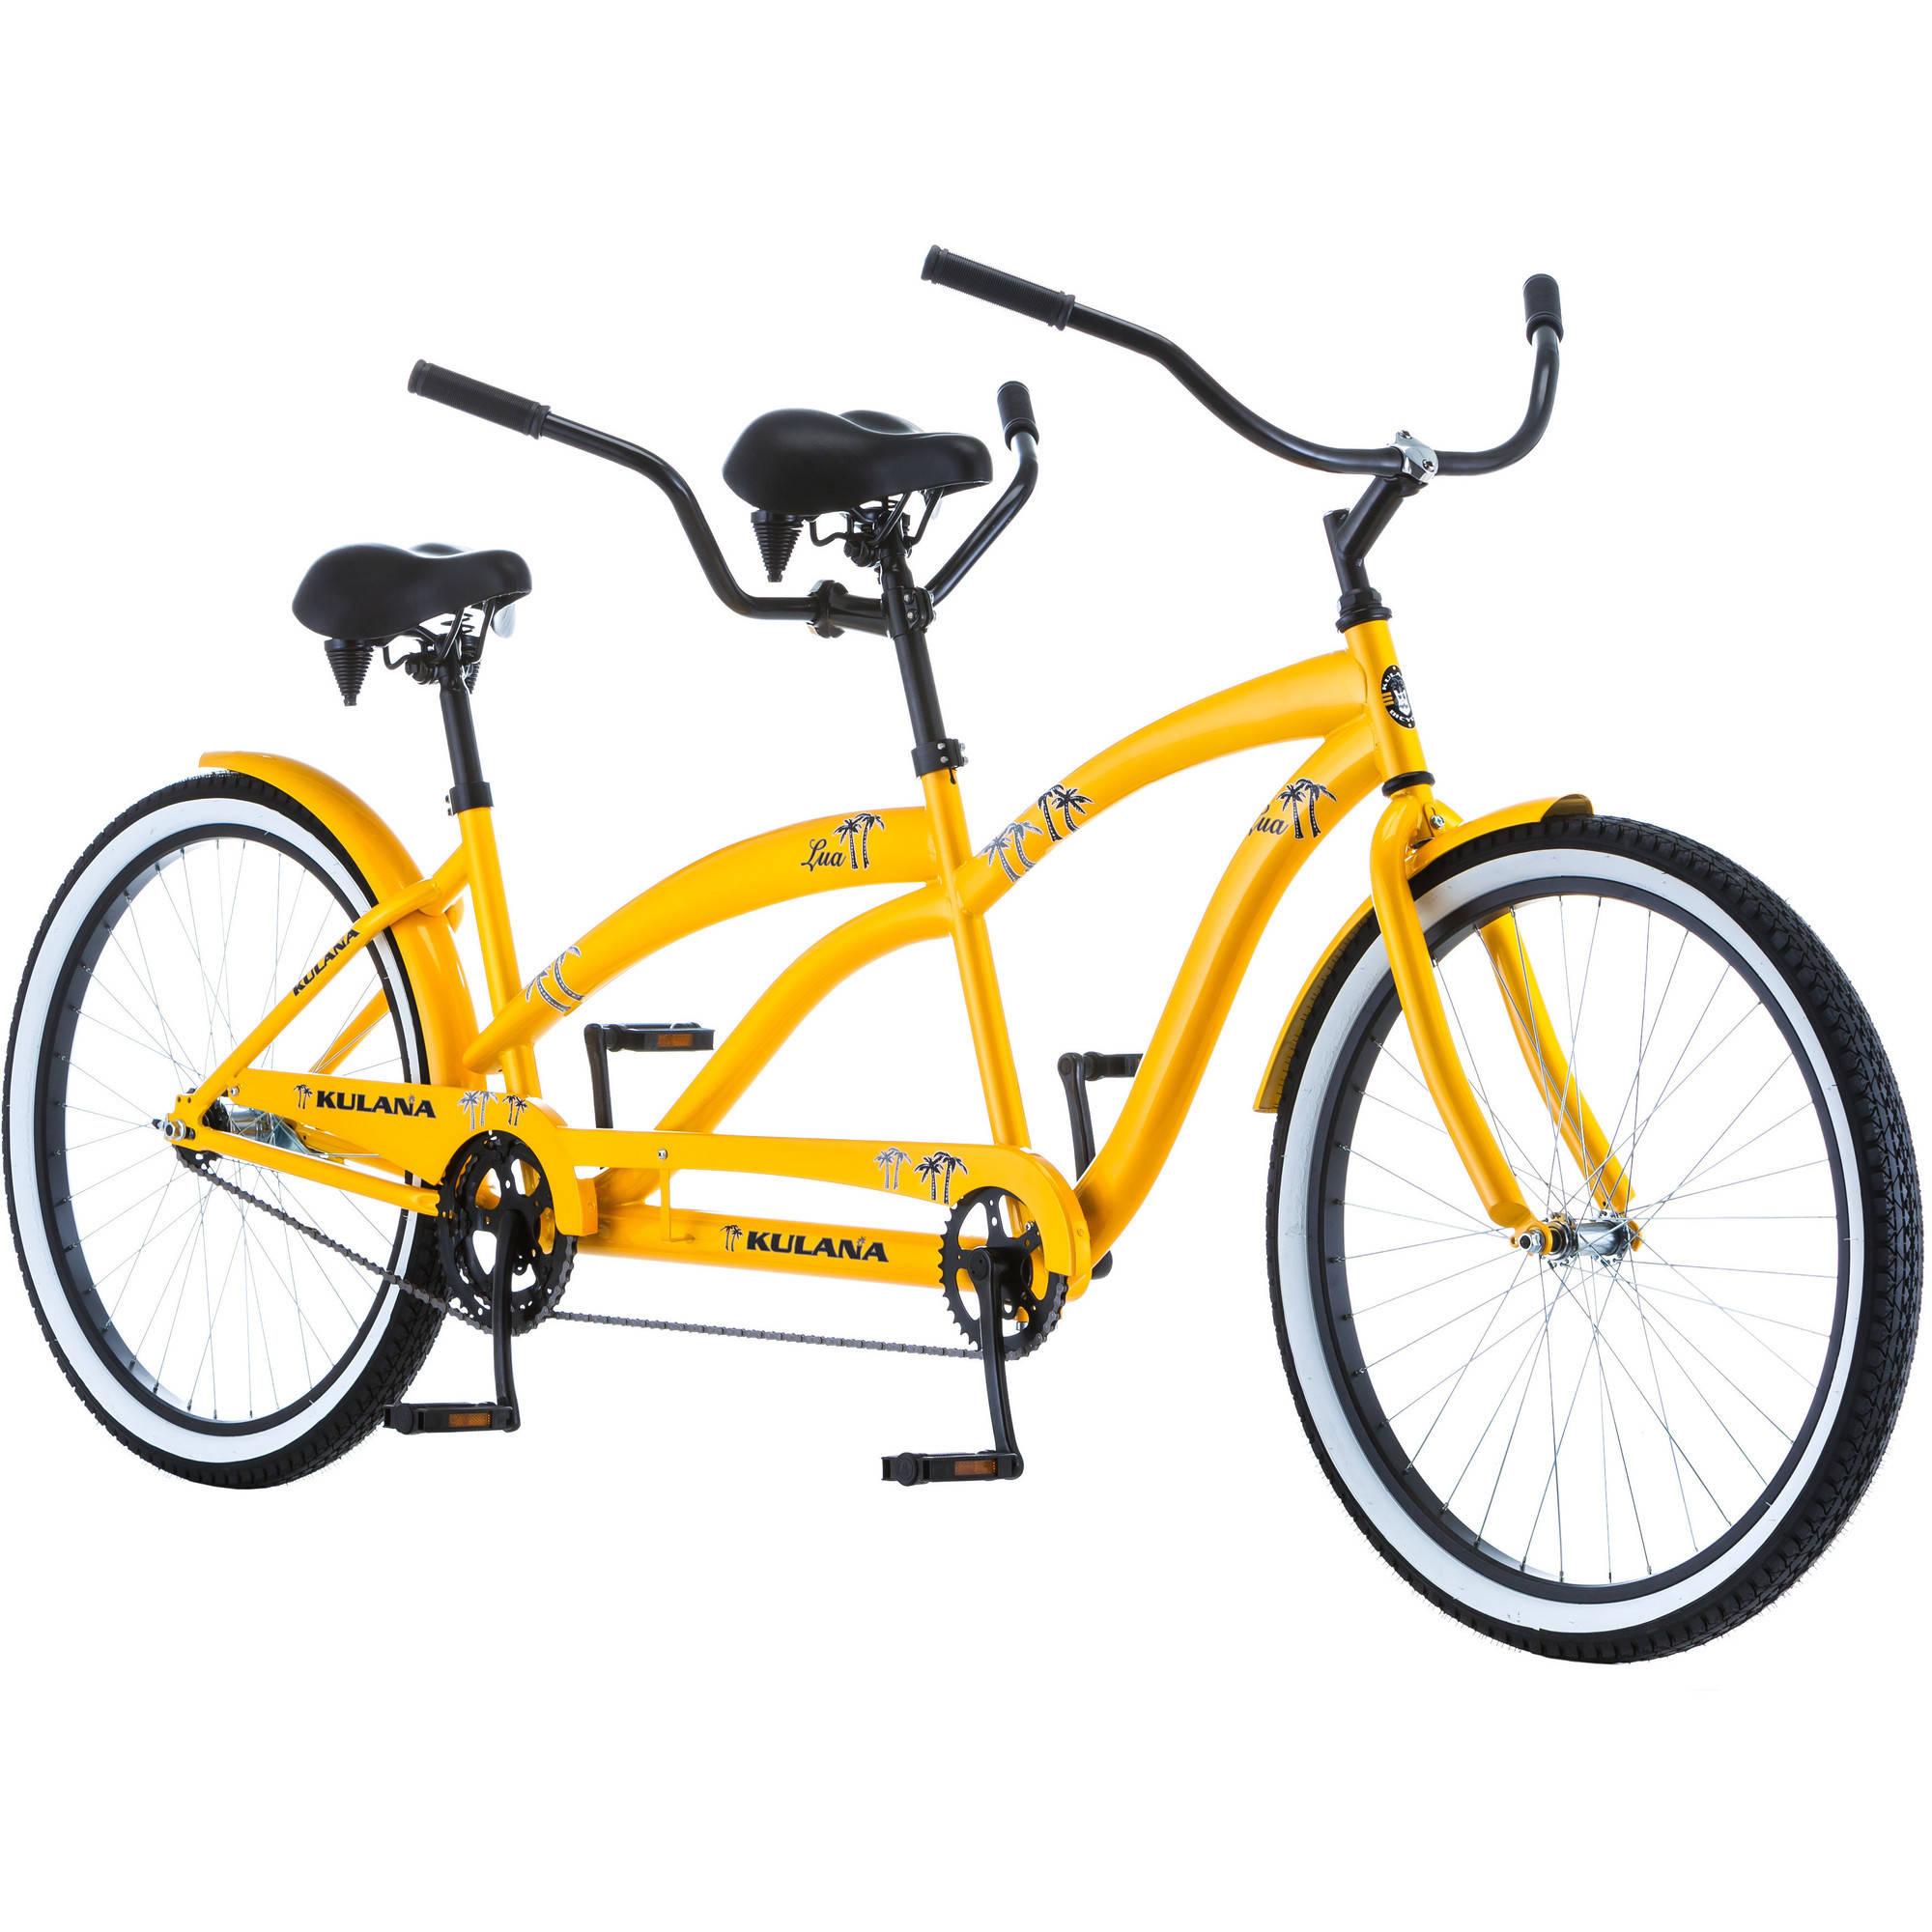 Yellow cycle photo